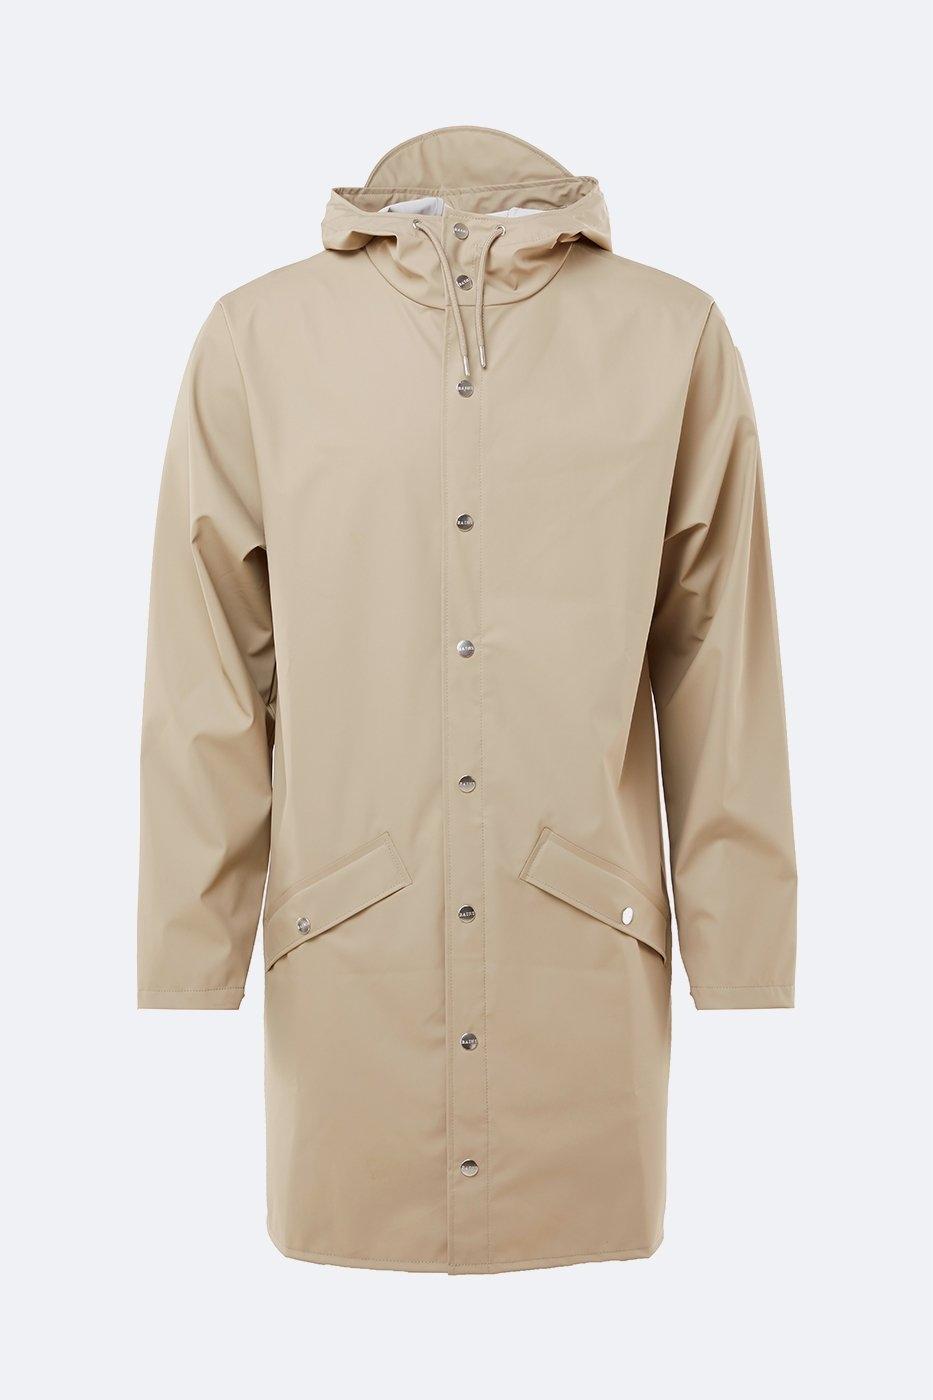 Rains Long Jacket beige unisex XS/S